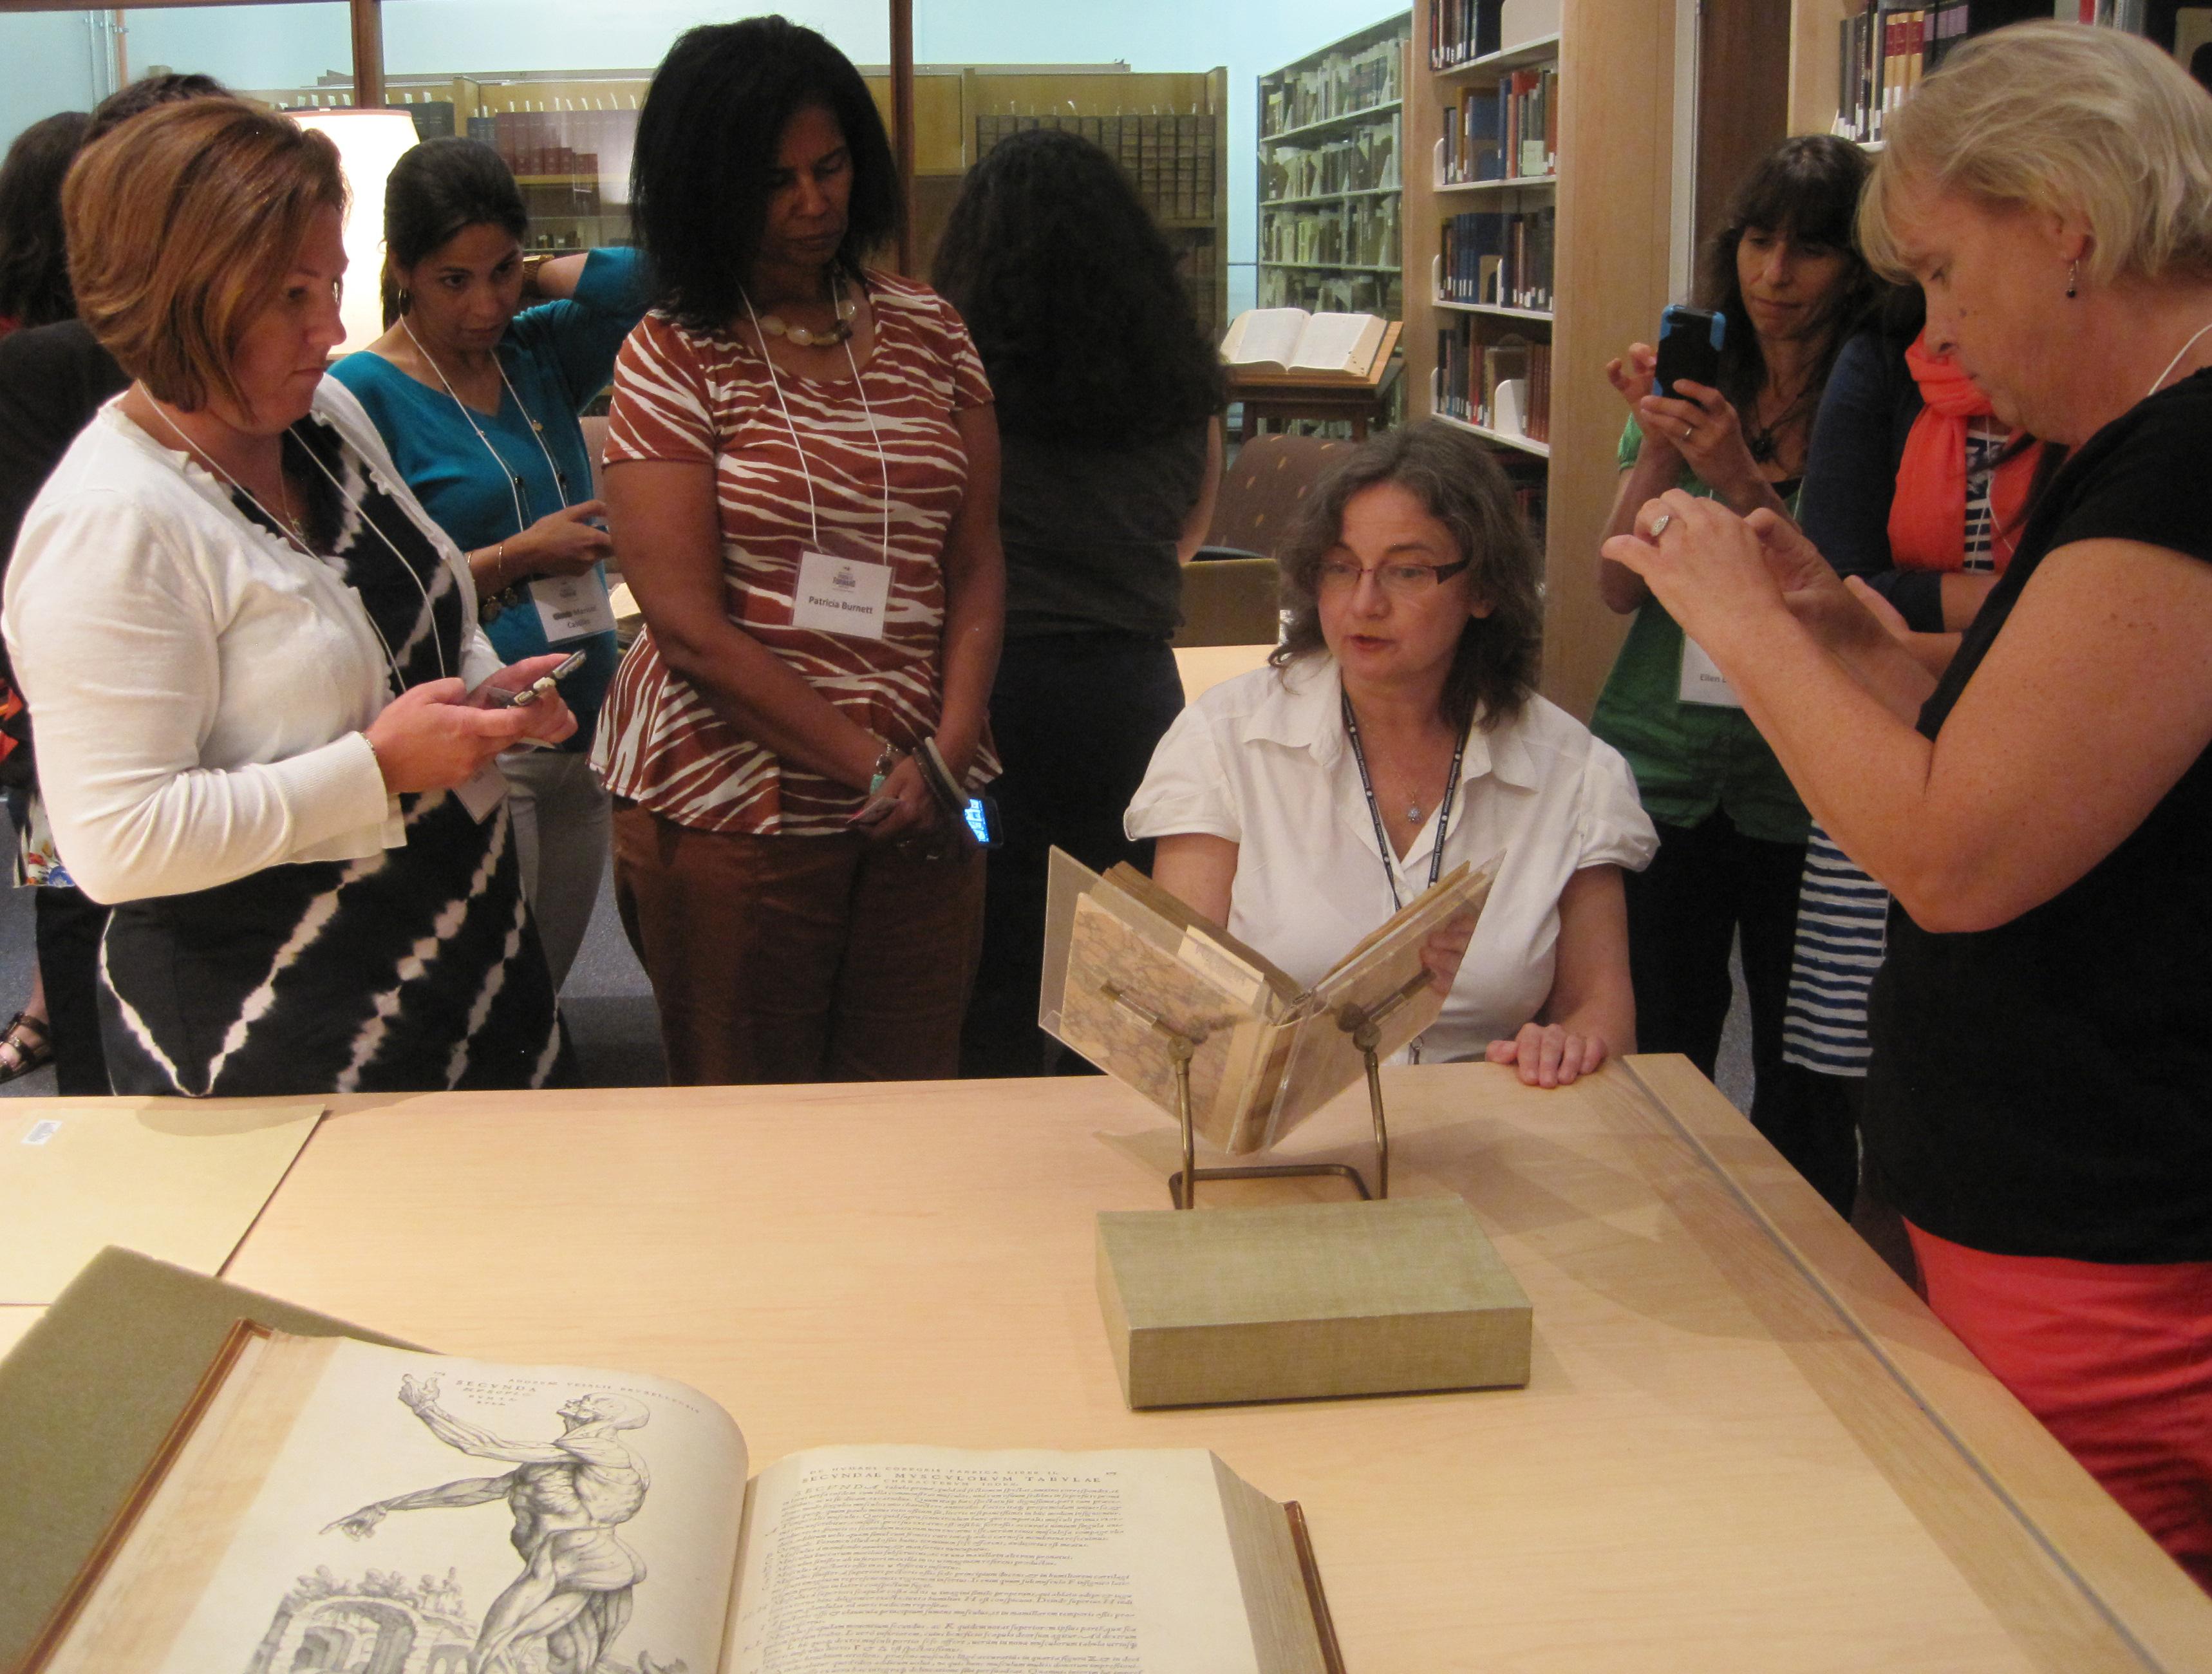 Teachers look at historic books